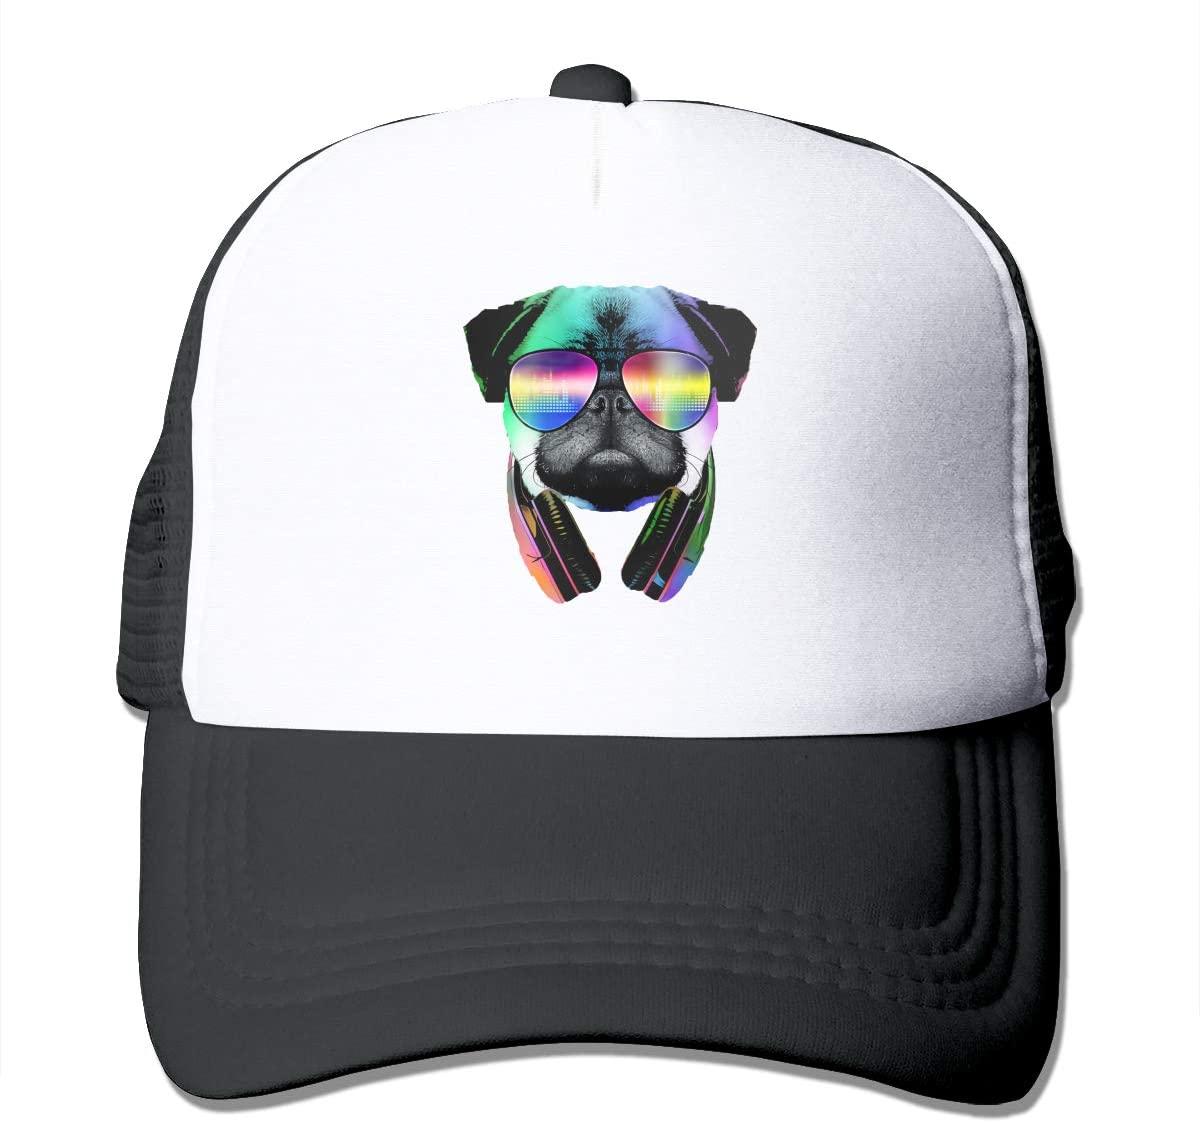 NOT Dj Pug Funny Trucker hat Love Hipster Adjustable Mesh Trucker Hat Baseball Cap